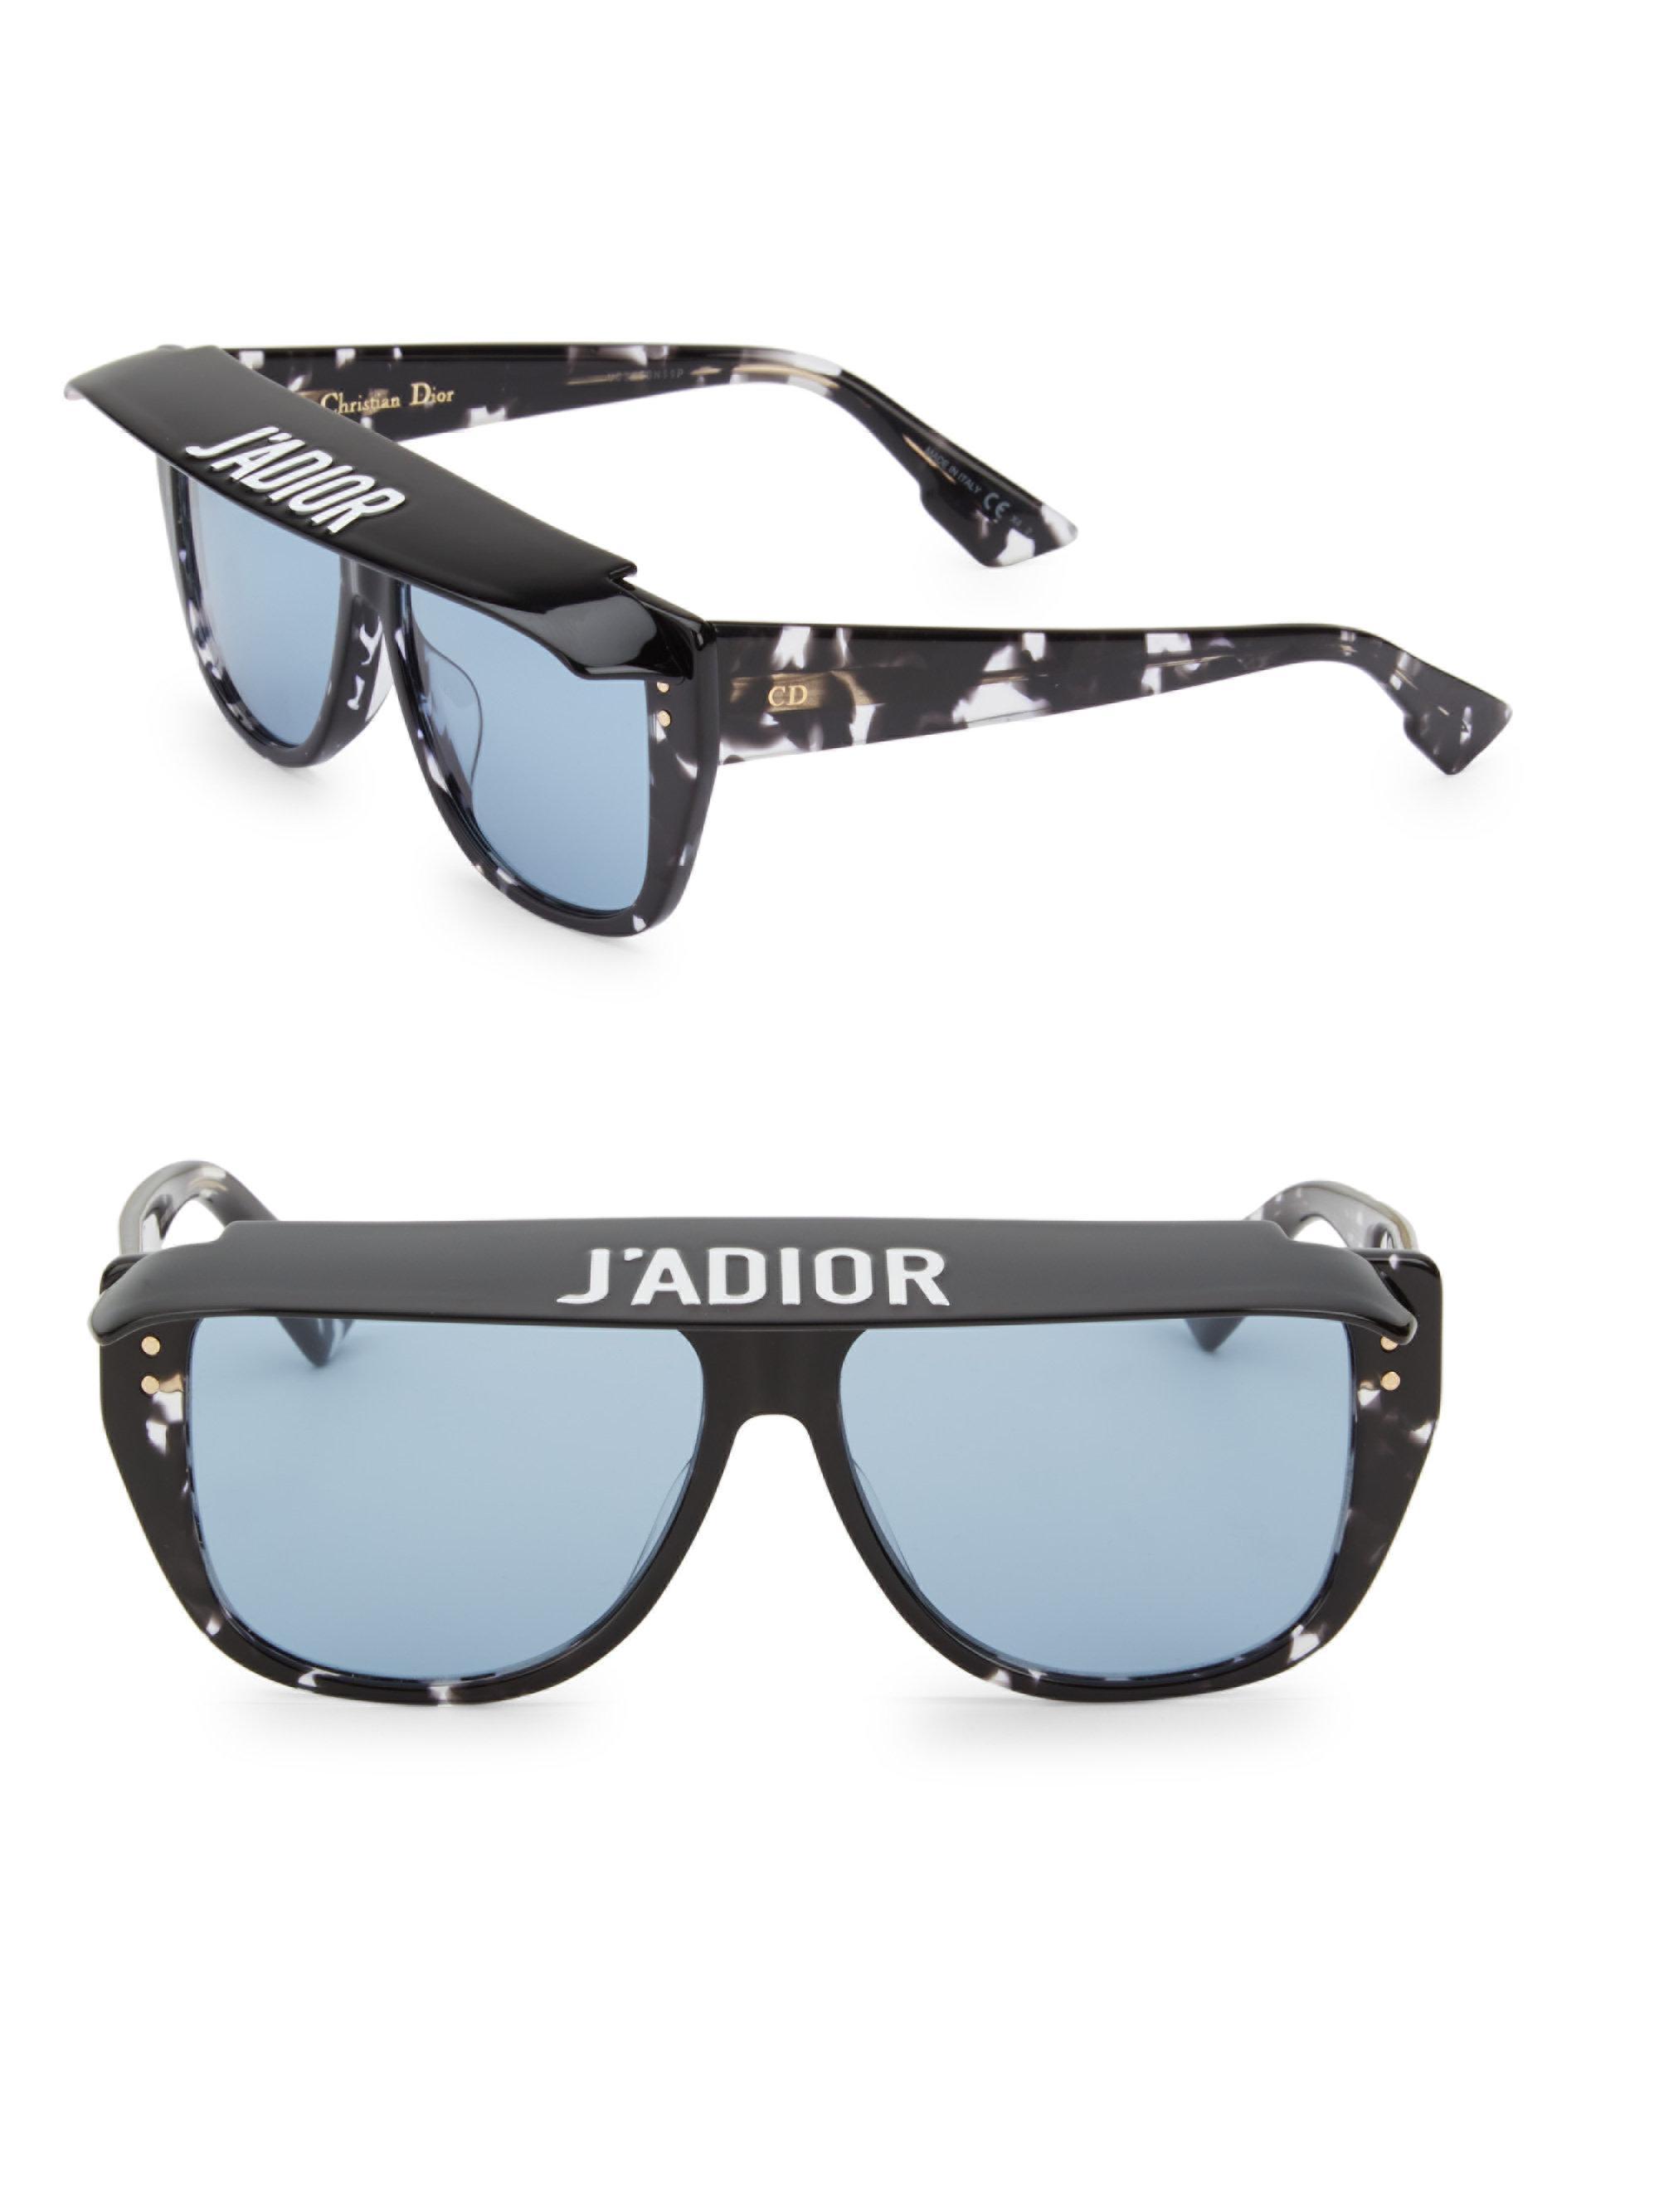 6dd9b19f94 Dior New Dior Club 2 Black Havana Blue Lens Visor Sunglasses